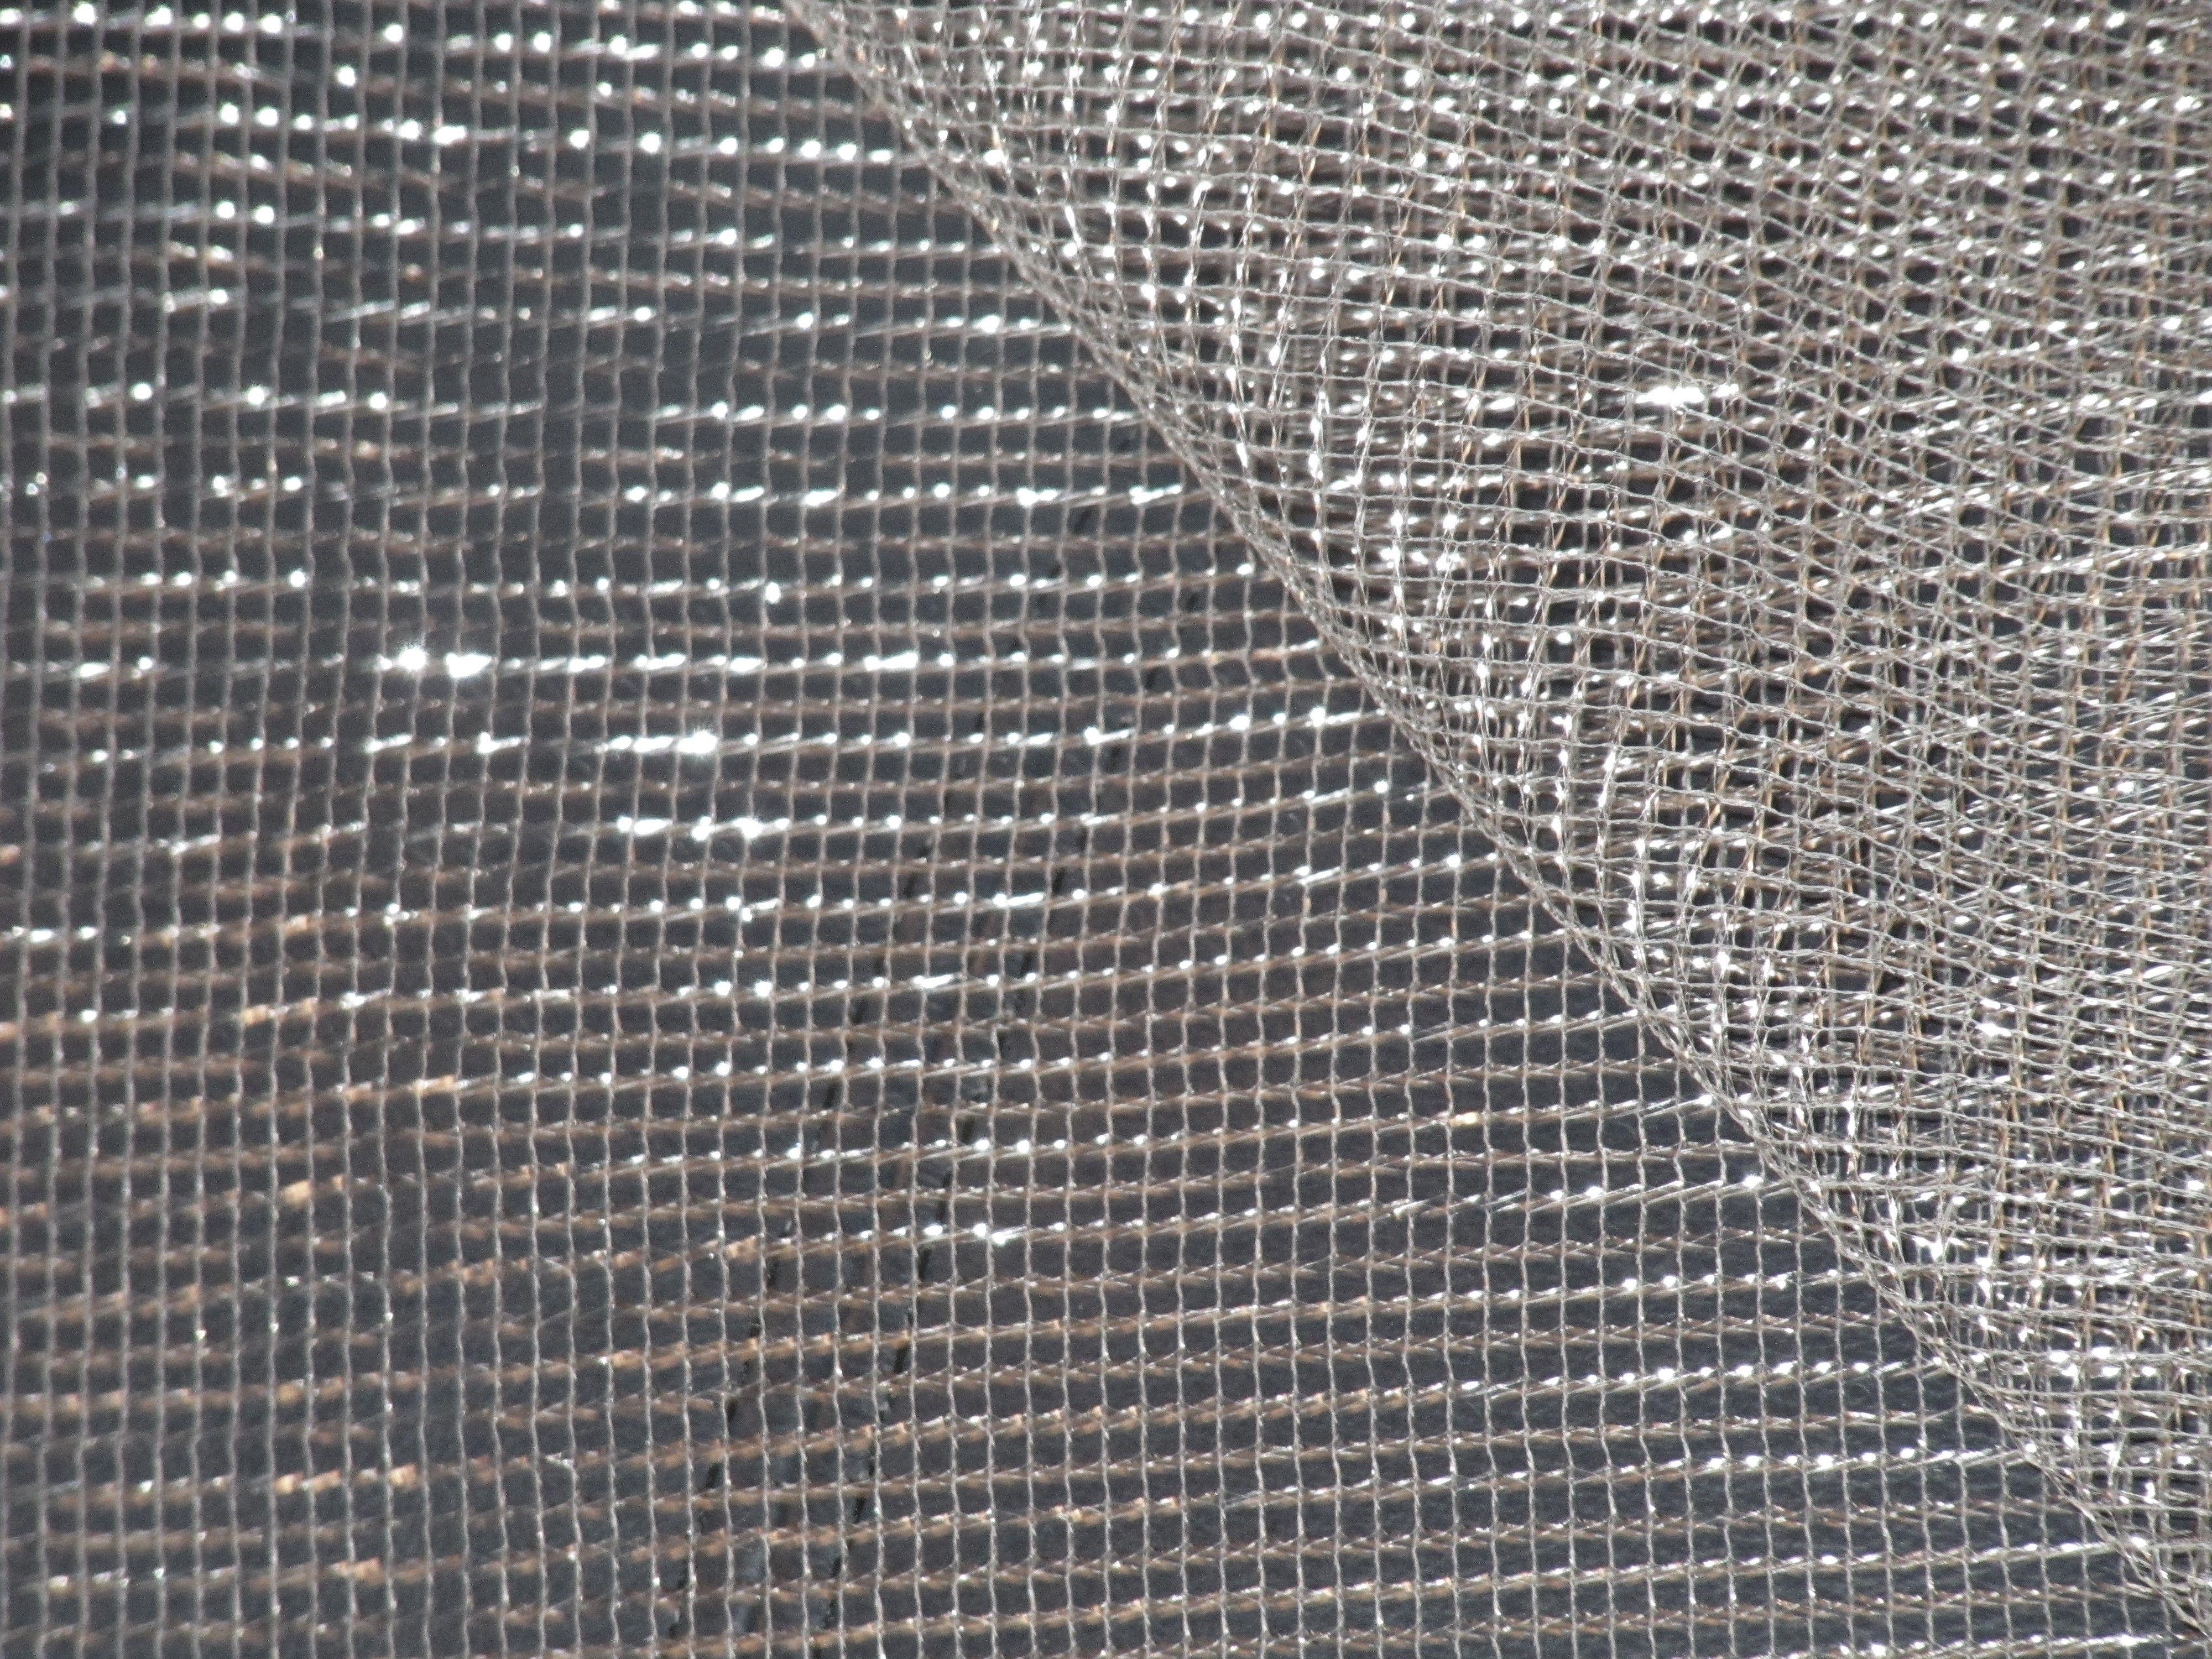 Silver mesh